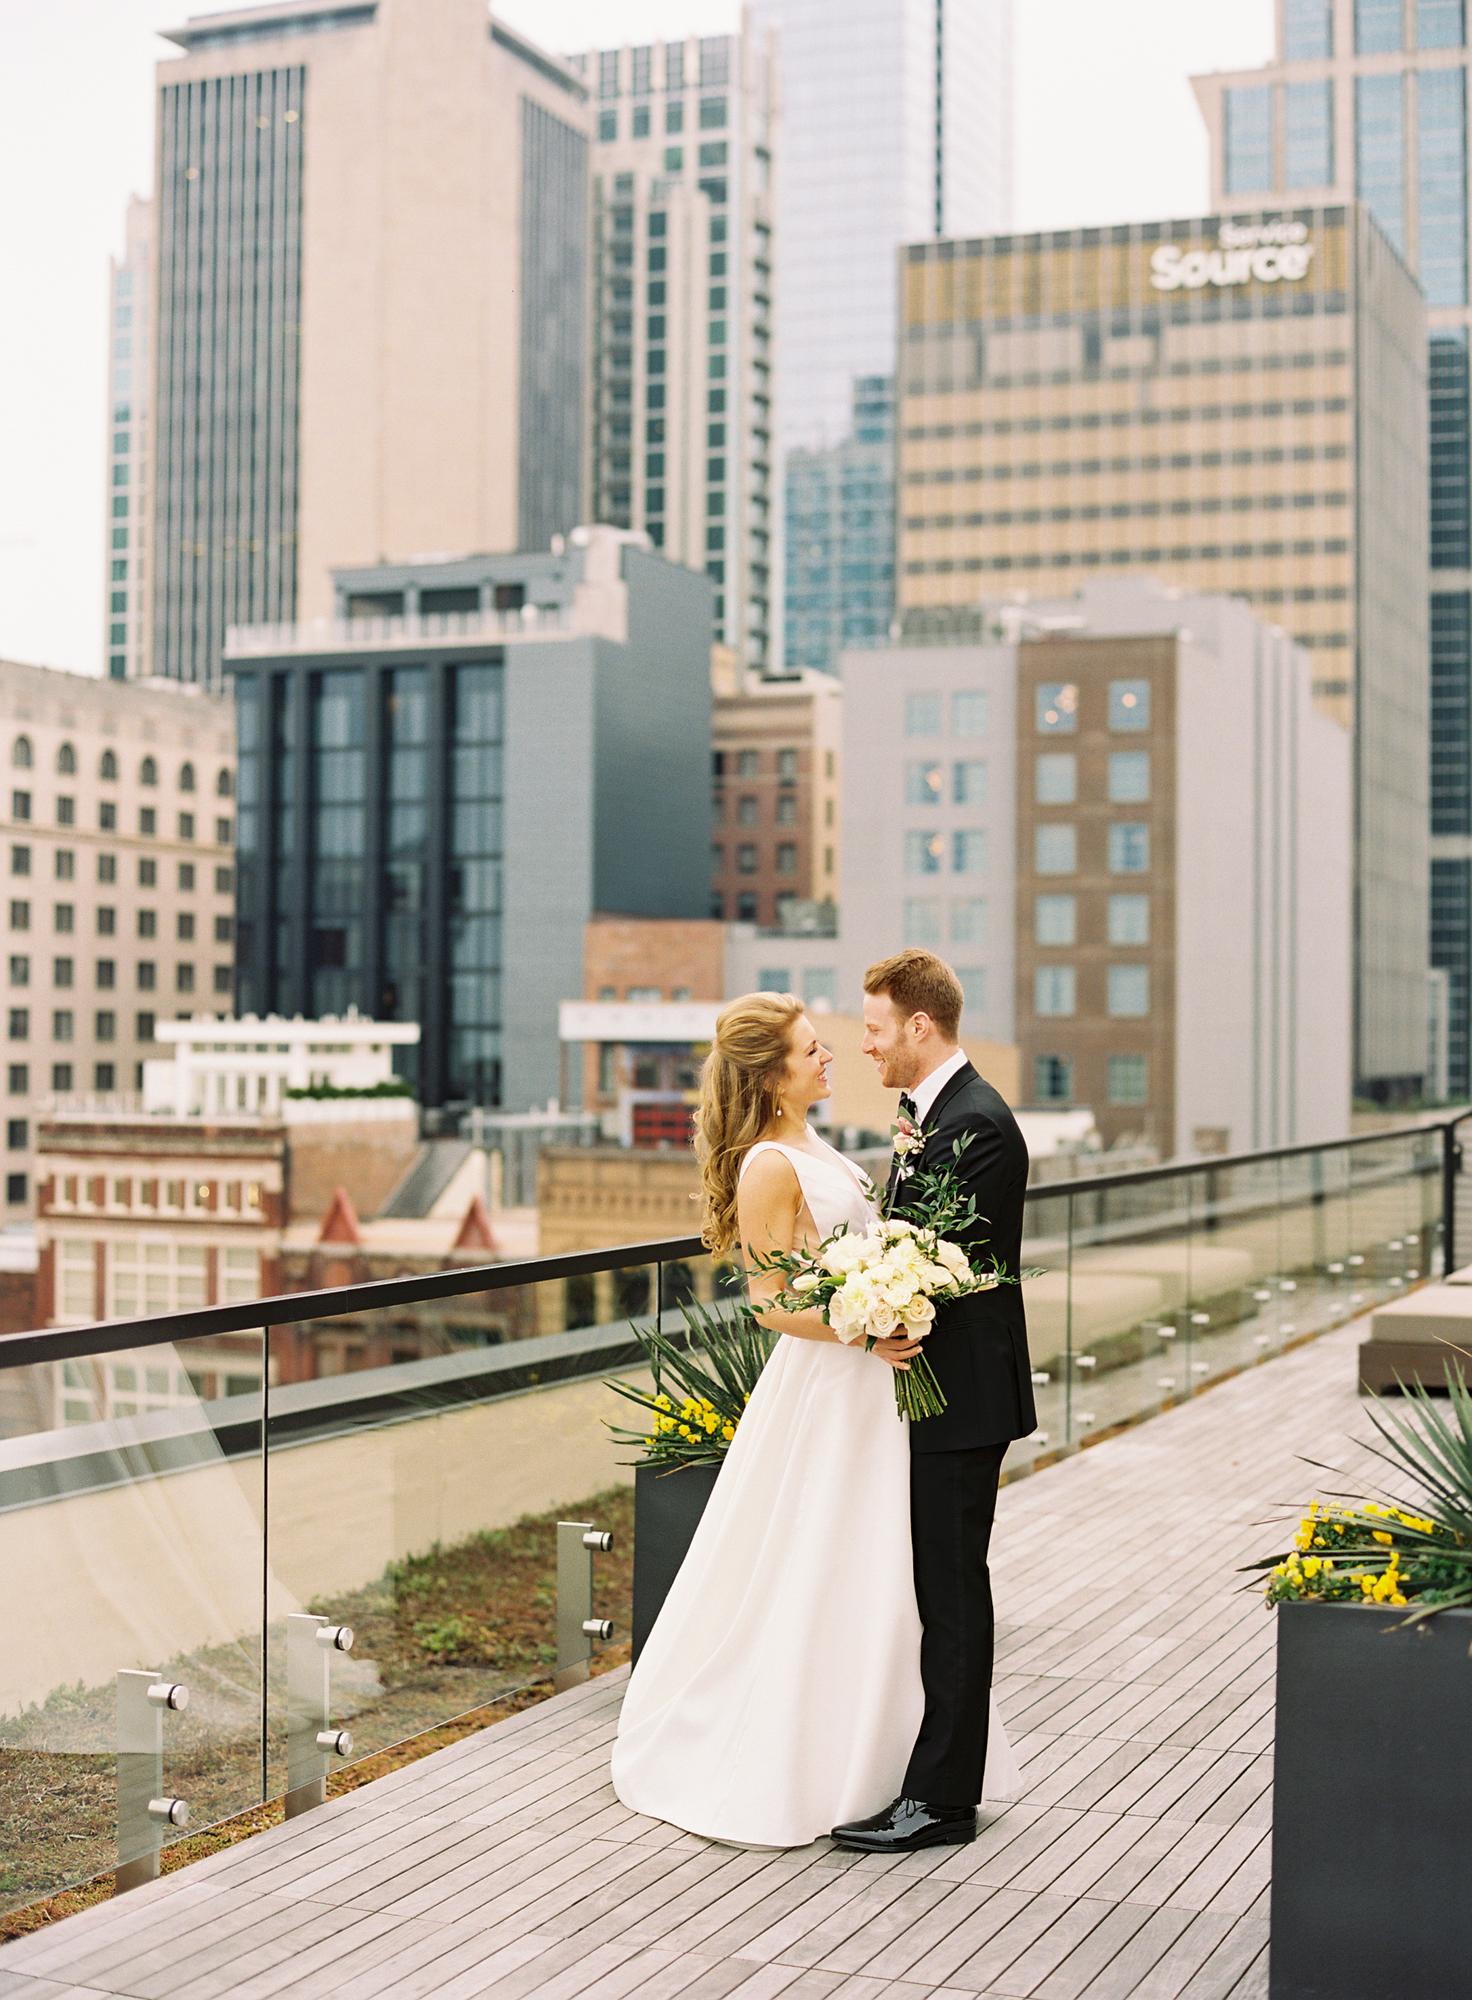 Nashville Wedding 21c Hotel and Museum-024.jpg